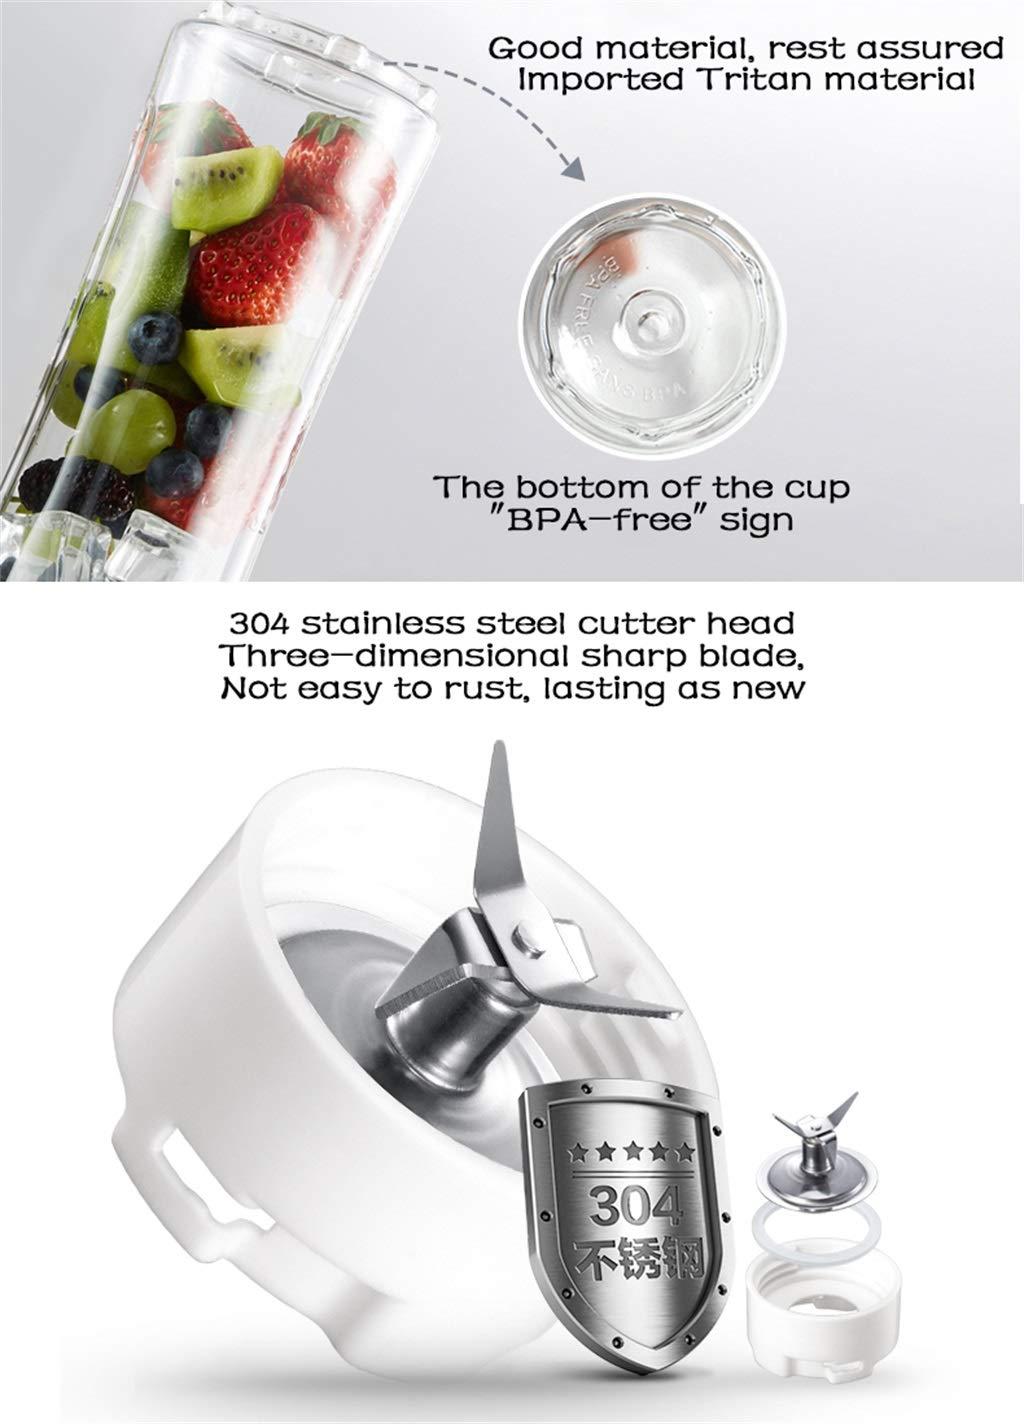 Kitchen Appliances Juicer portátil, Taza de Jugo Fresca Multiuso del hogar, Mini Taza de Jugo eléctrica, Taza portátil del Jugo 600ml + 400ml (Color ...